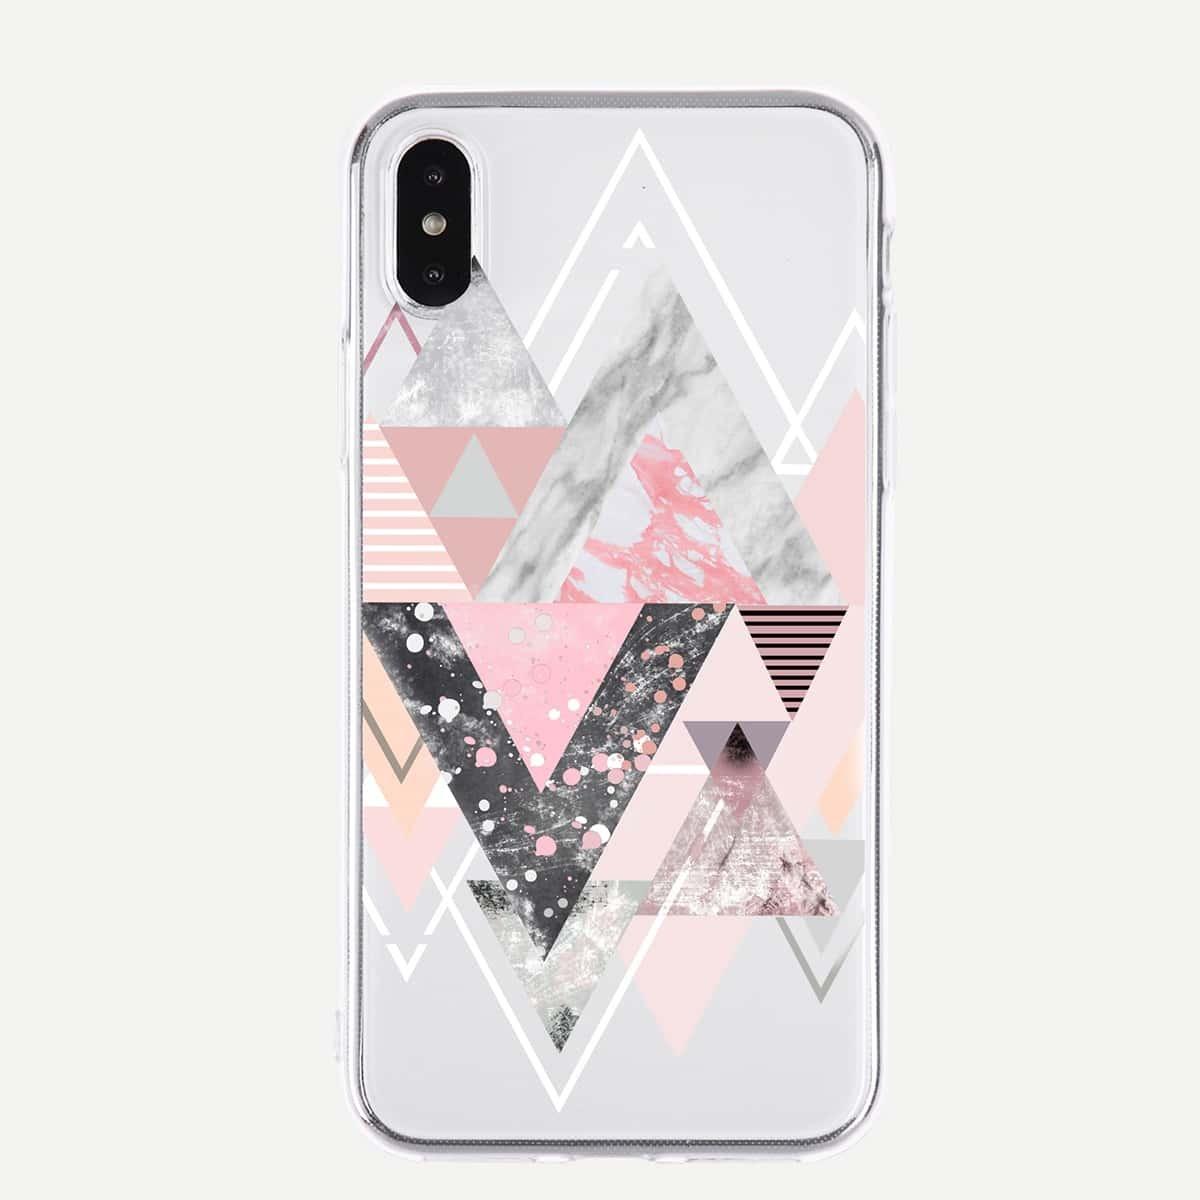 iPhone Hülle mit Dreieck Muster